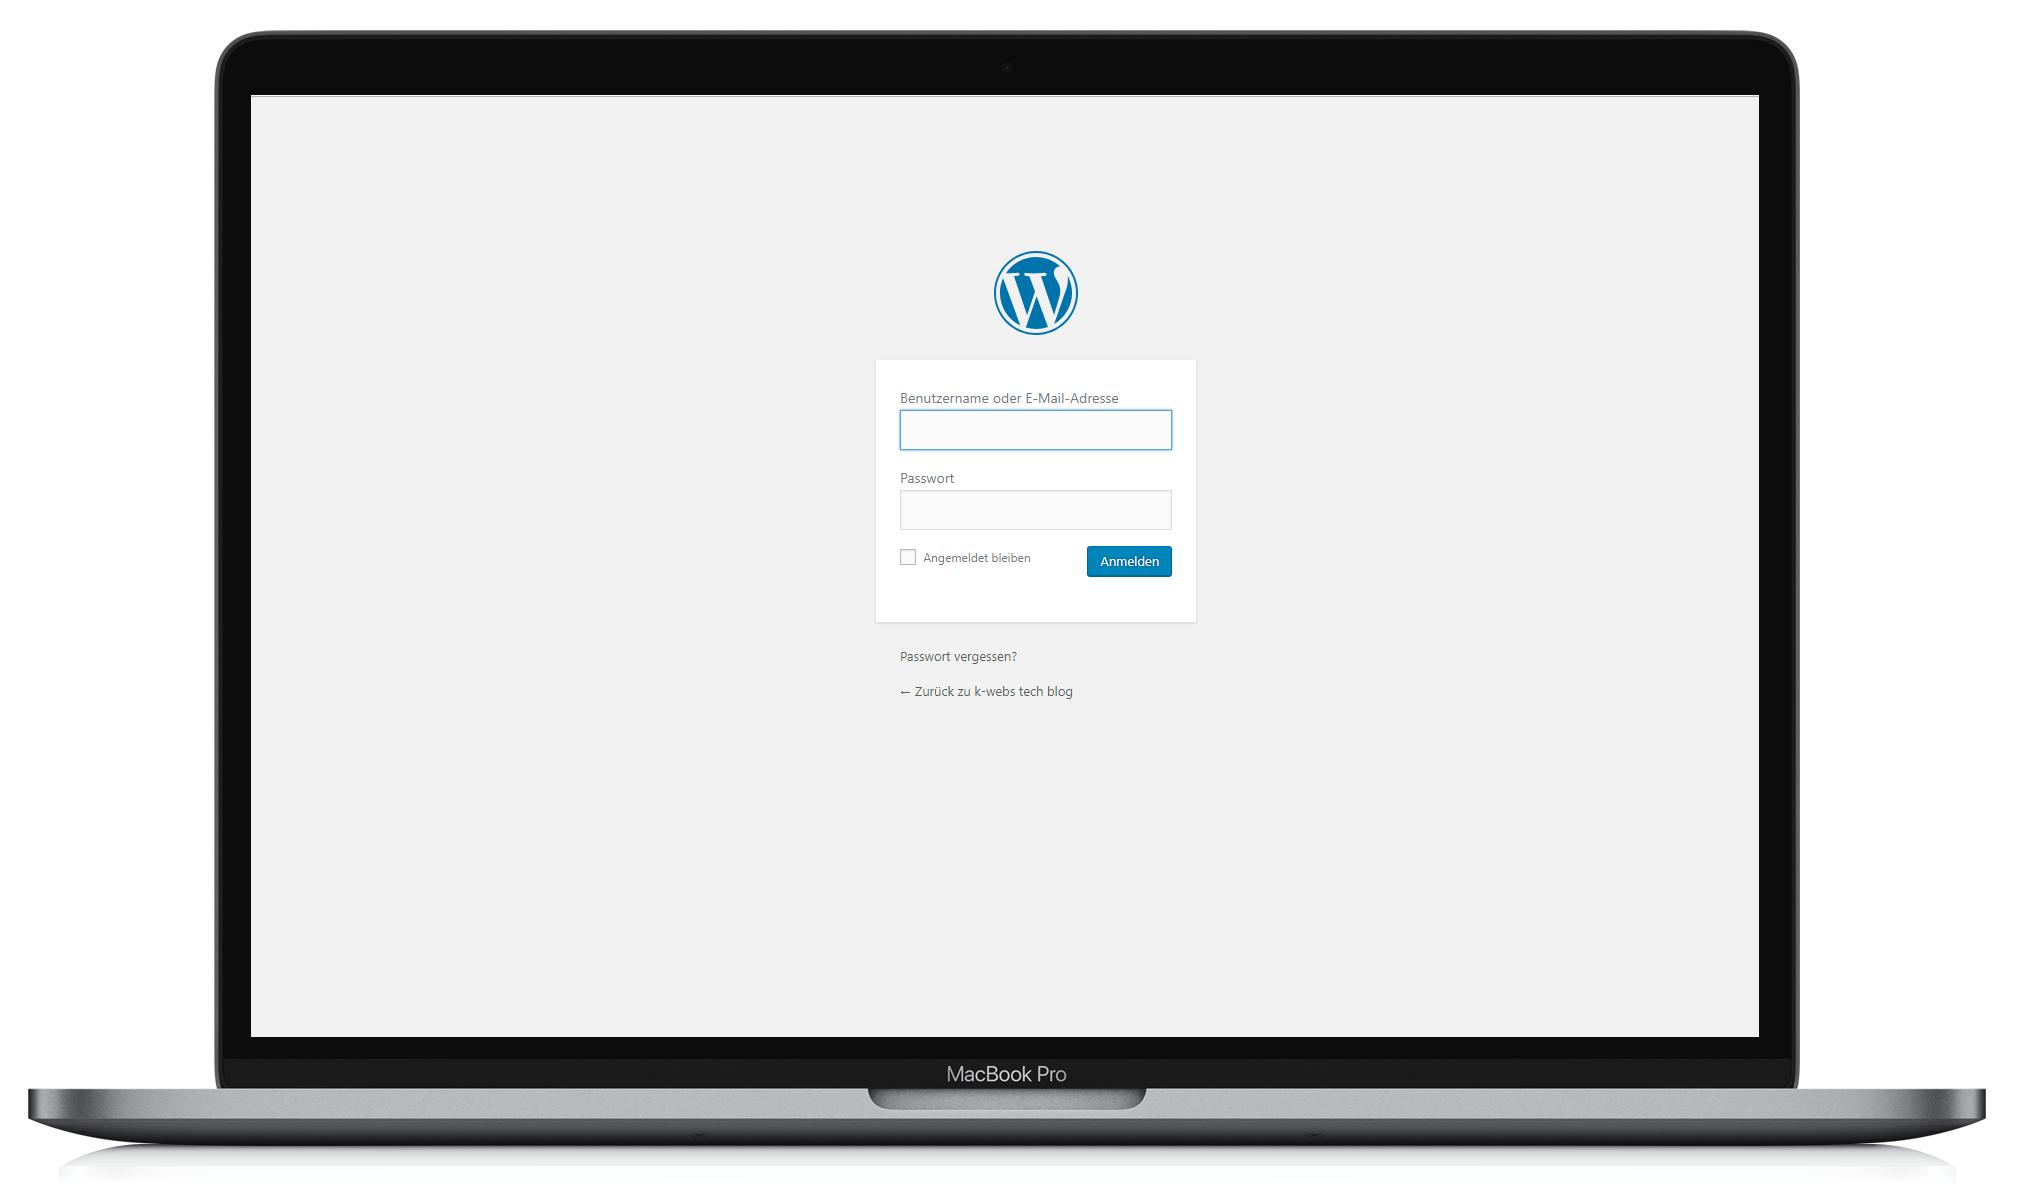 wordpress cms k-webs